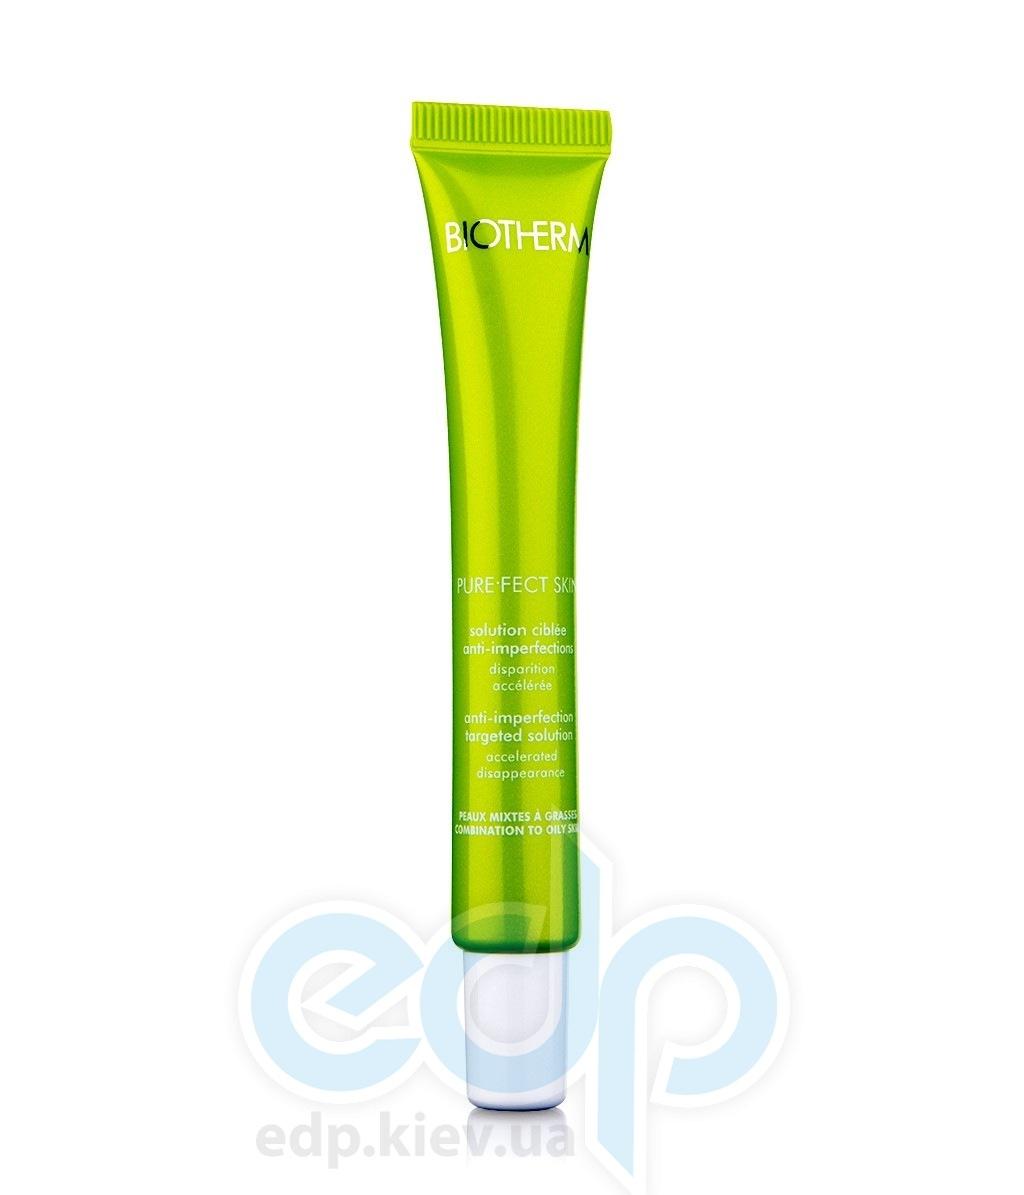 Гель для лица от прыщей Biotherm - Pure.Fect Skin Targeted Solution - 15ml (BT 078846)